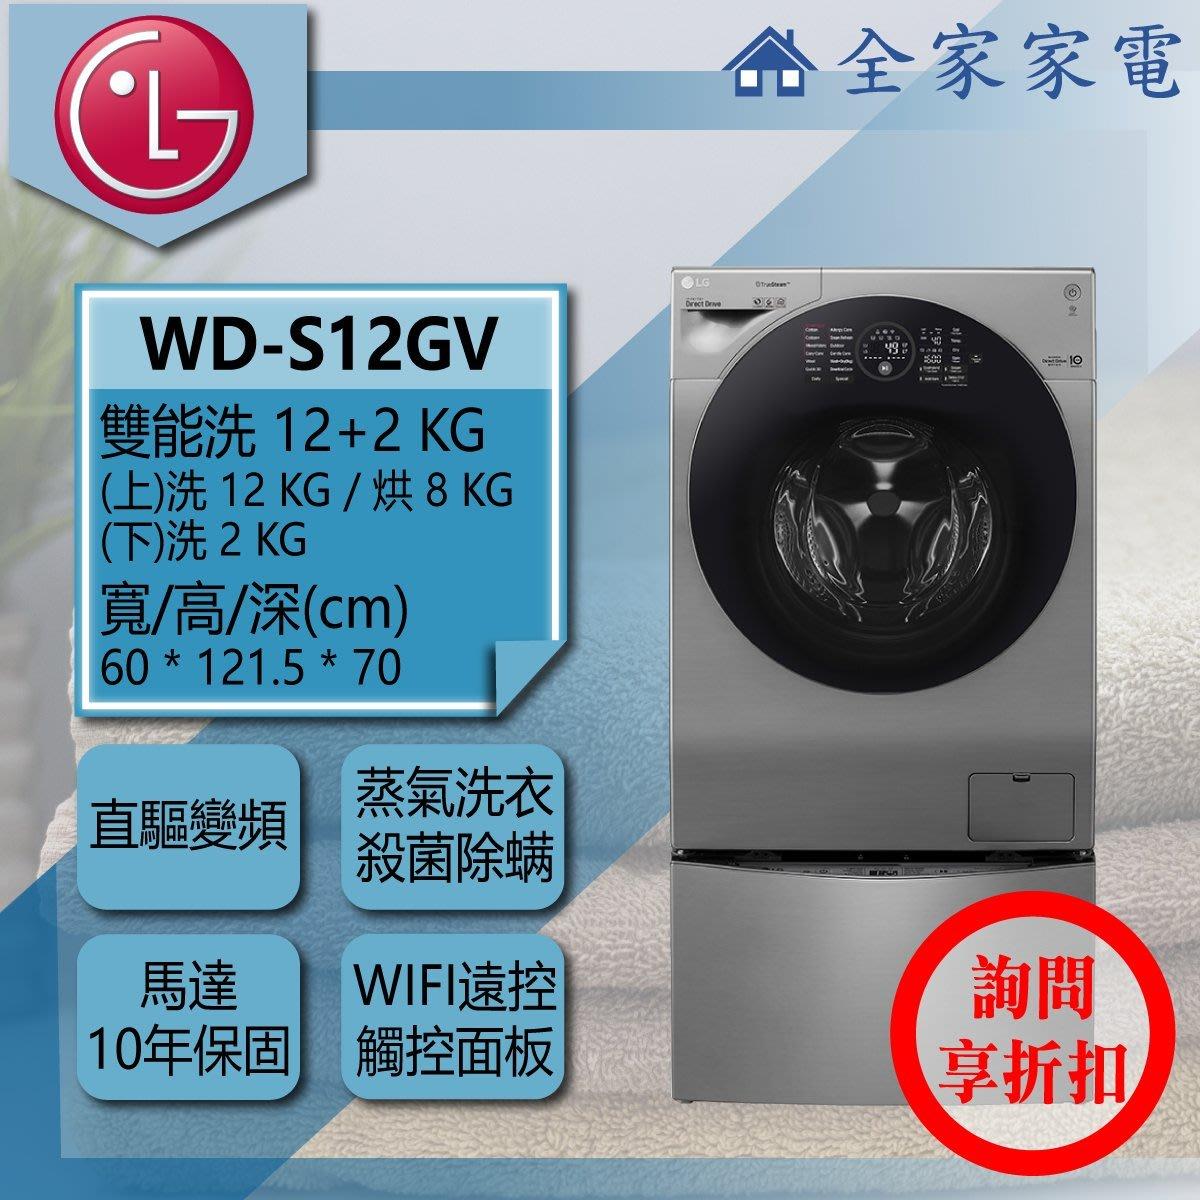 【問享折扣】LG 乾衣機 WR-90TW + WD-S12GV【全家家電】另可搭 WR-90TV